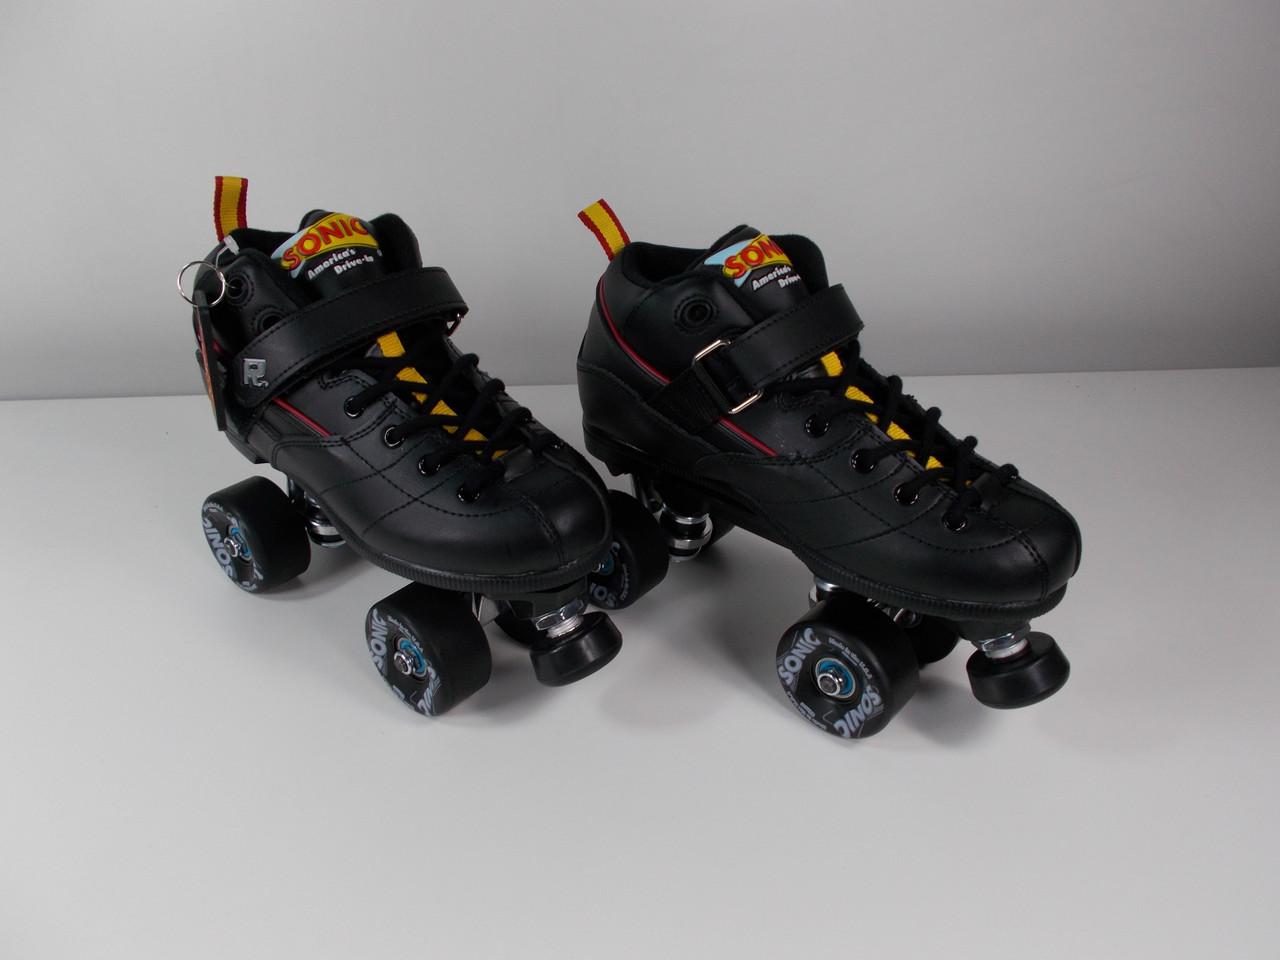 Roller Skates On Sales Rollerskatenation Com >> Slightly Used The Sonic Outdoor Roller Skate Size 7 With Black Sonic Wheels